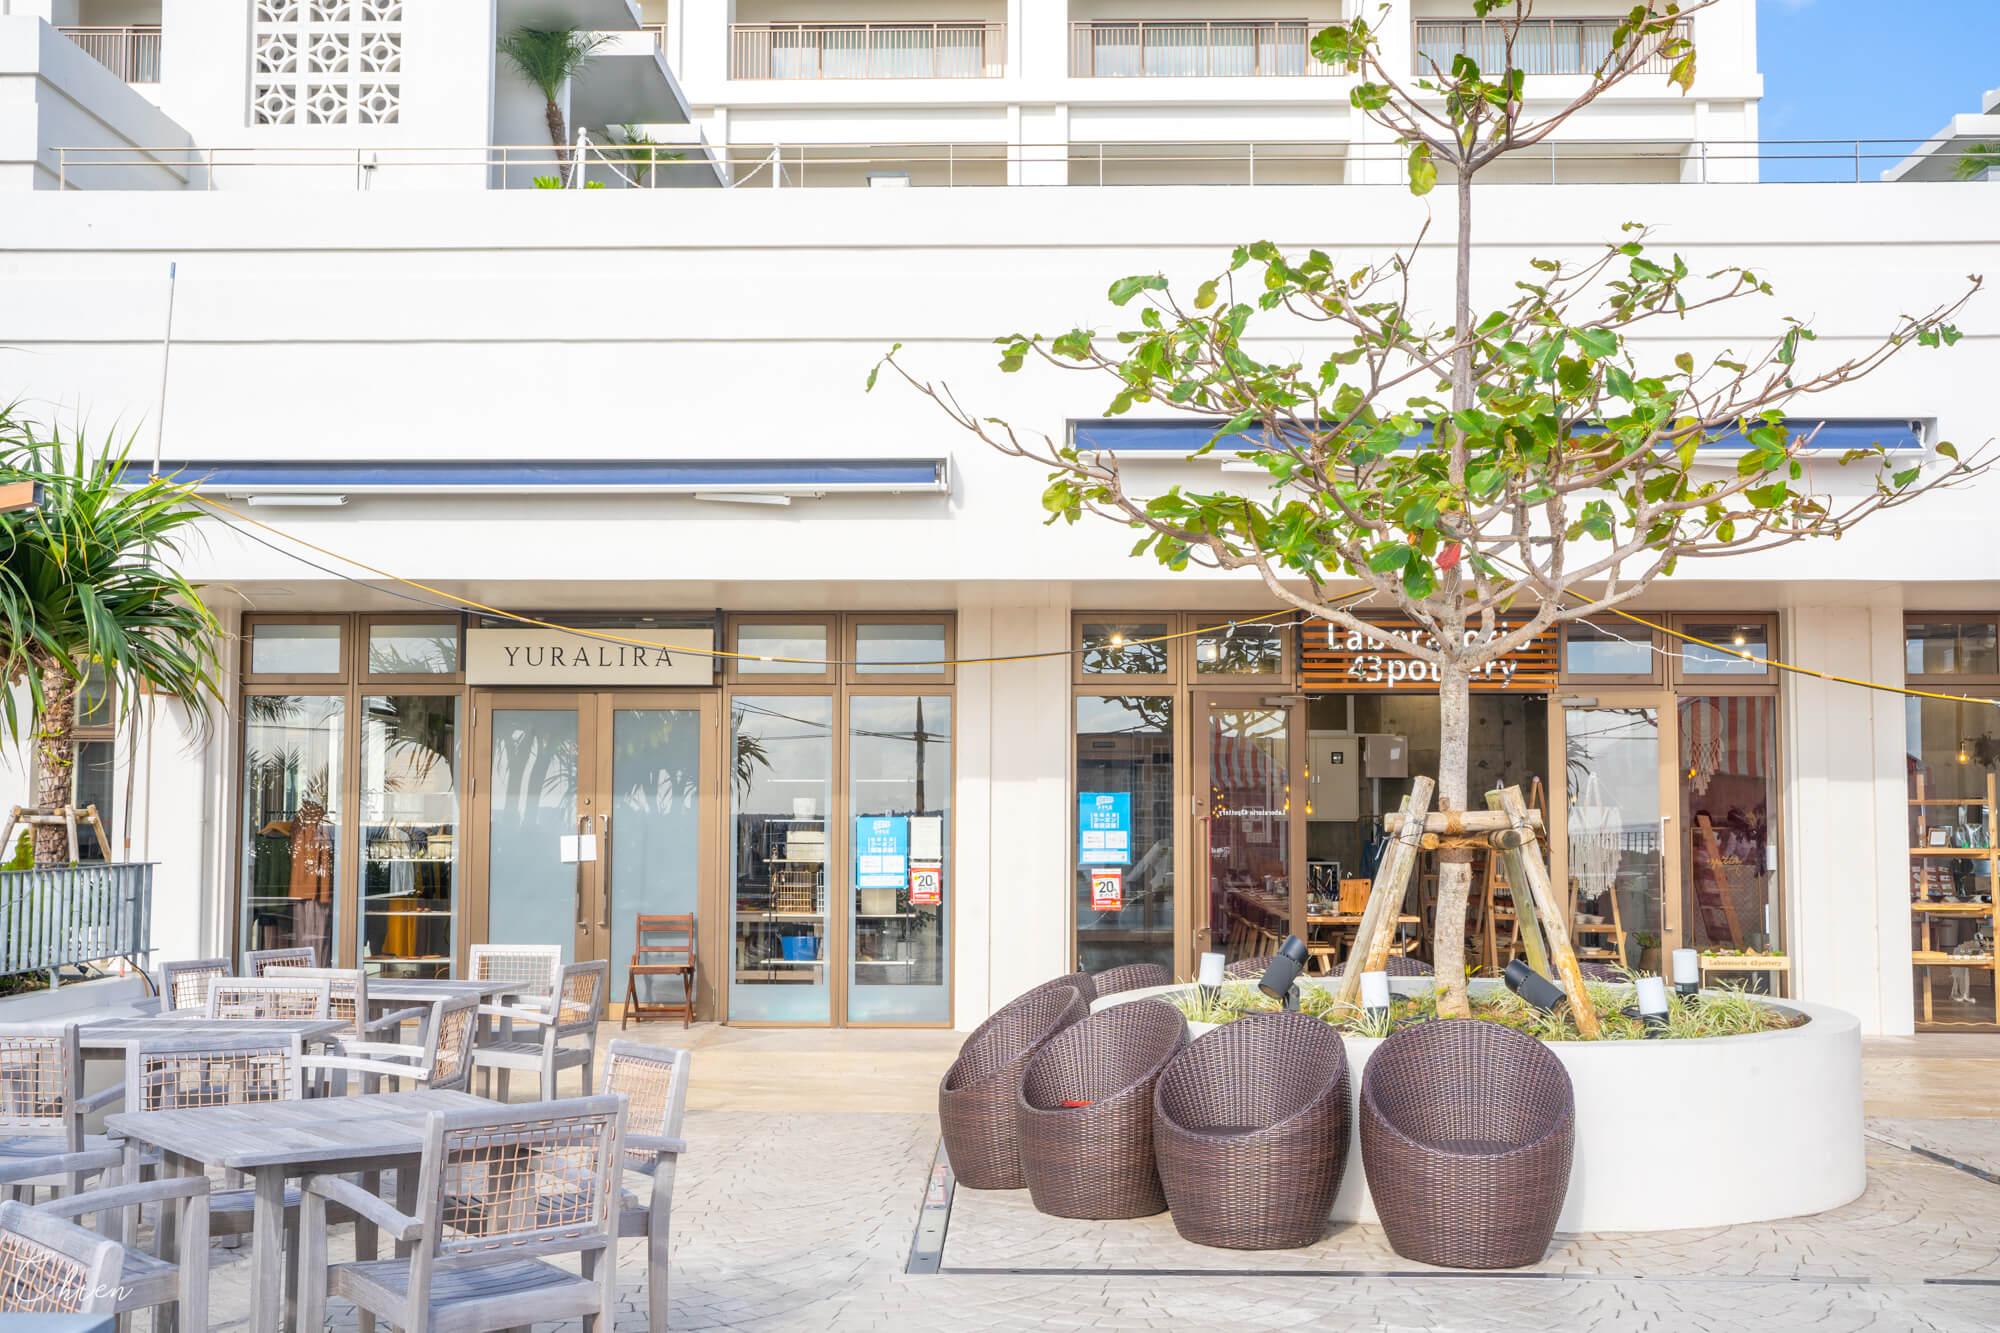 Starbucks 沖繩北部美麗水族館 市集商場